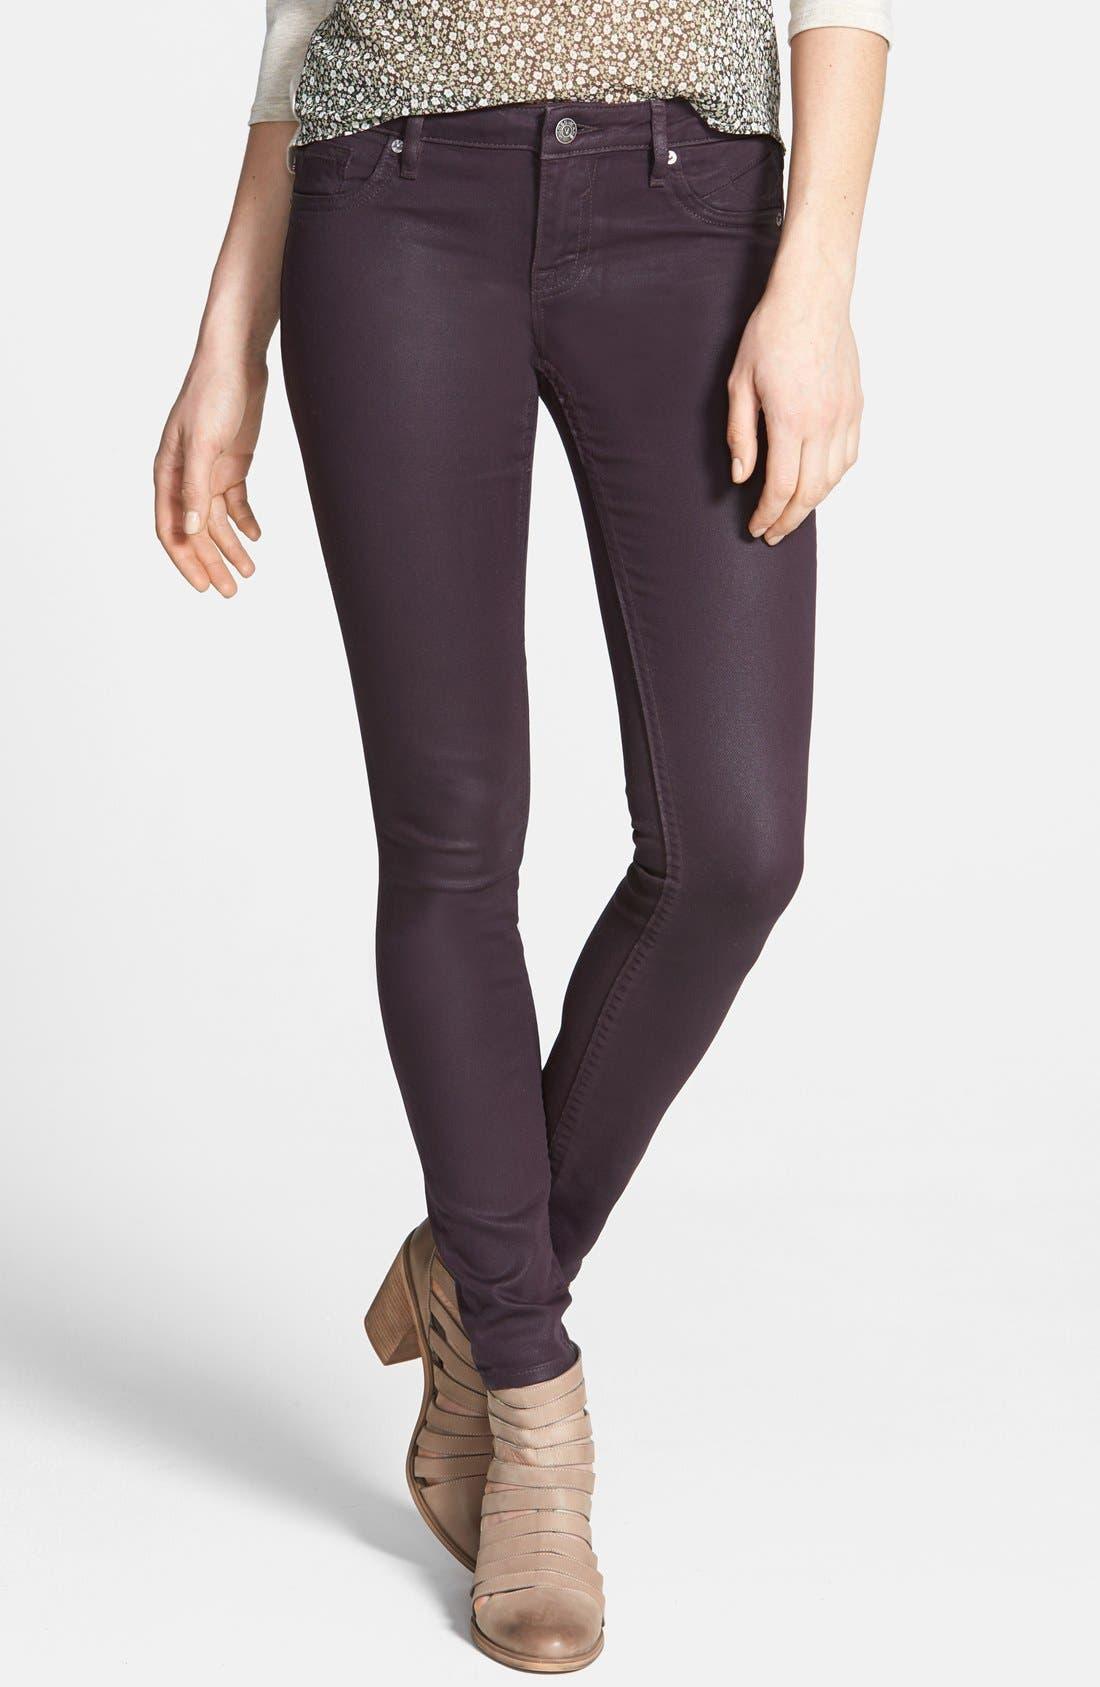 Alternate Image 1 Selected - Vigoss Coated Skinny Jeans (Eggplant) (Juniors)